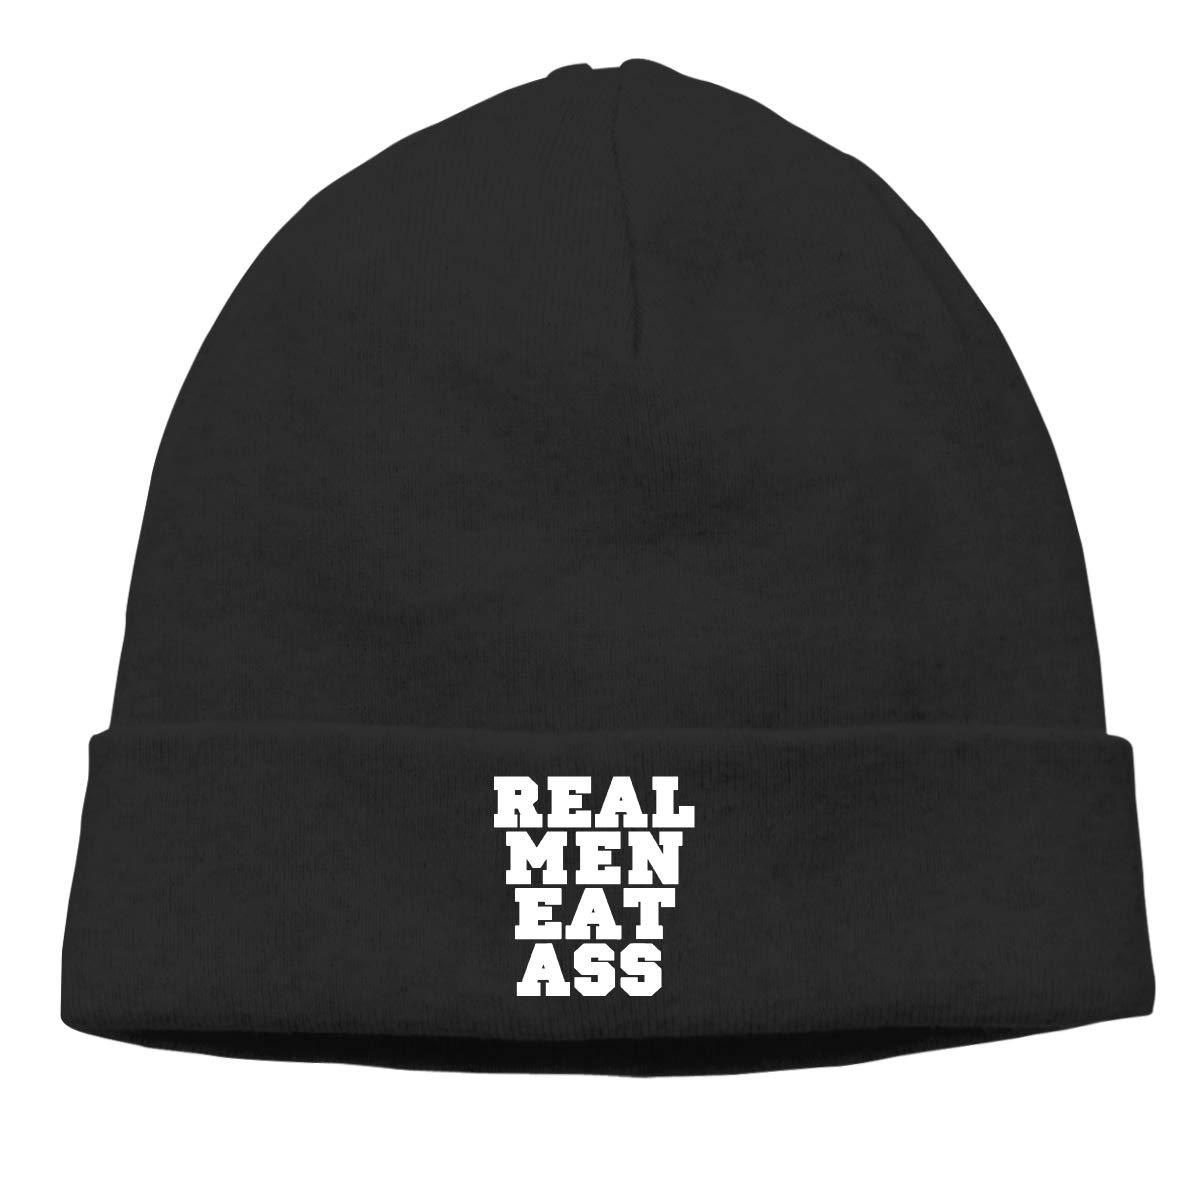 Real Men Eat Ass Logo Men Women Warm /& Stylish Beanie Skull Cap